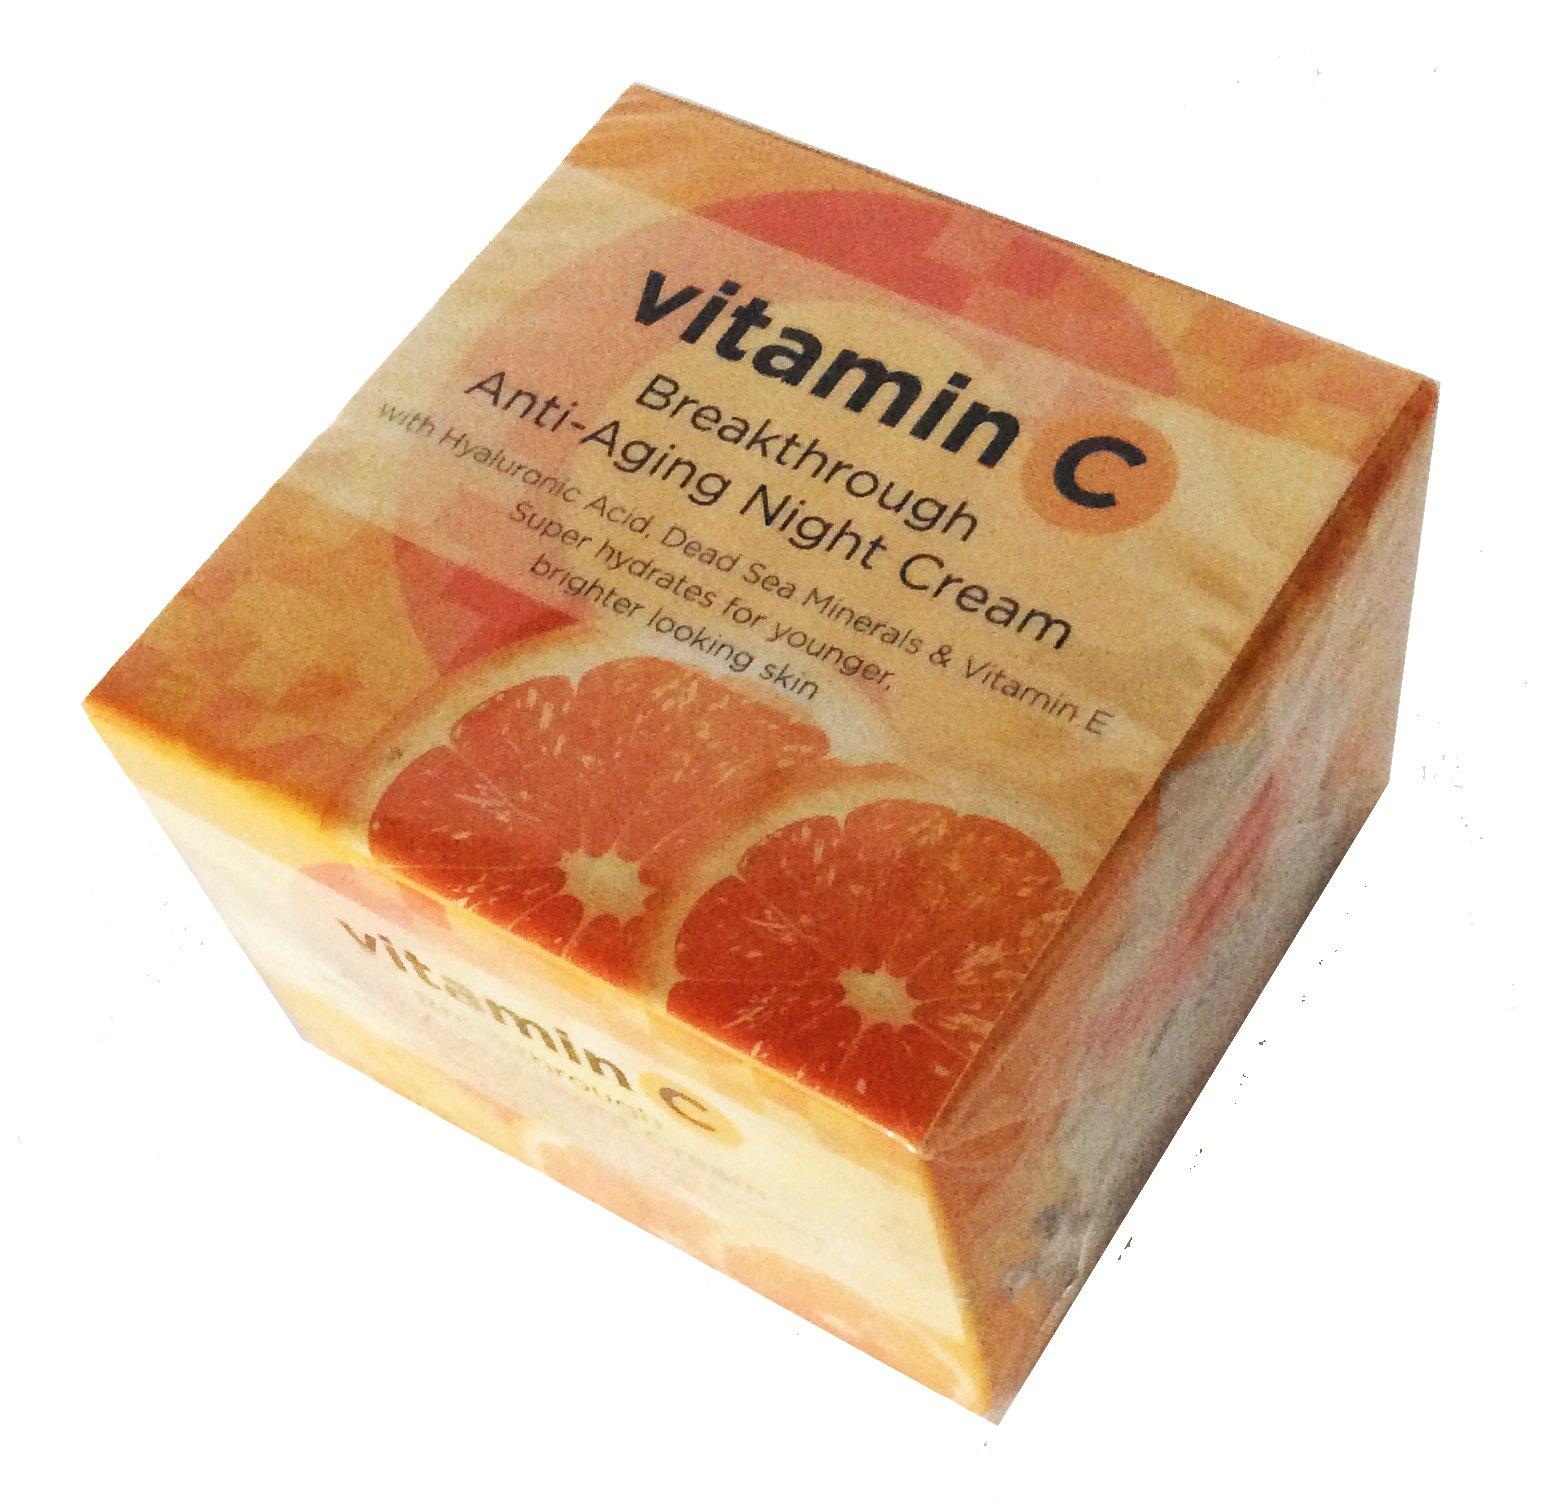 VITAMIN C ANTI-AGING NIGHT CREAM with Hyaluronic acid, Dead Sea Minerals & Vitamin